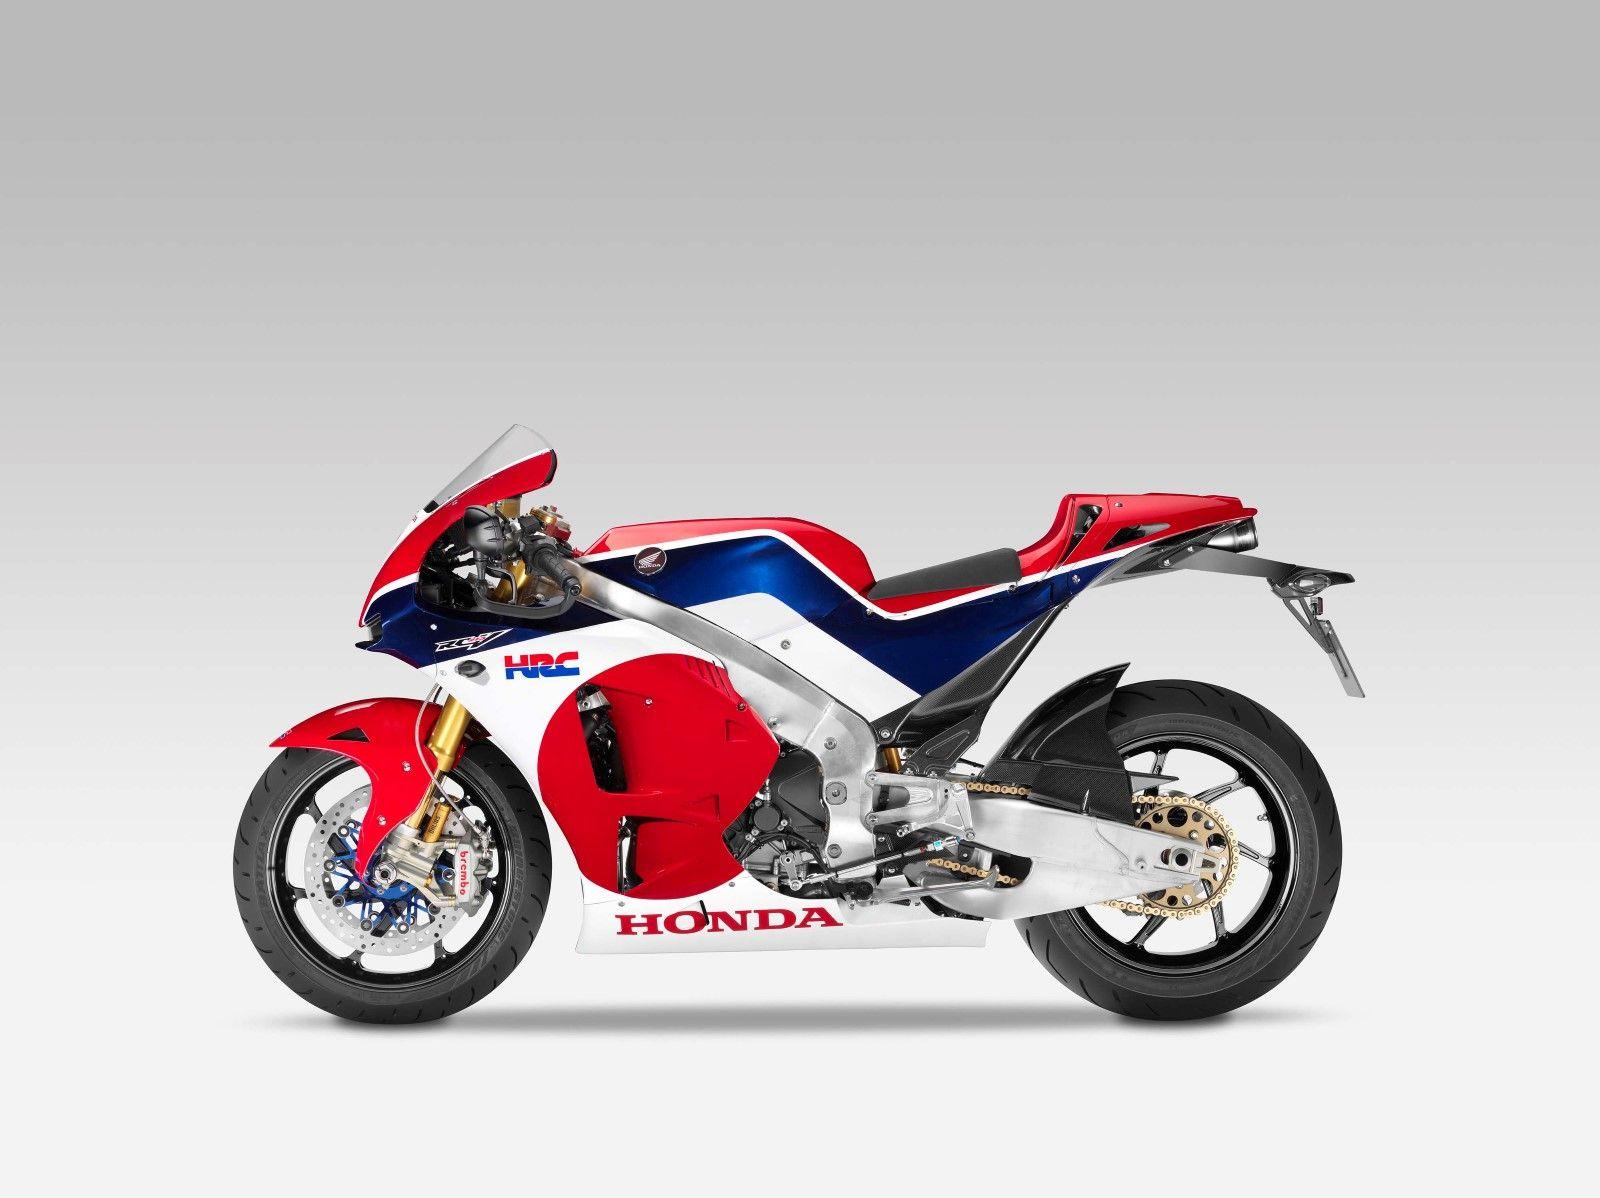 Is the Honda RC213V S the Newest MotoGP Inspired V 4 Streetbike